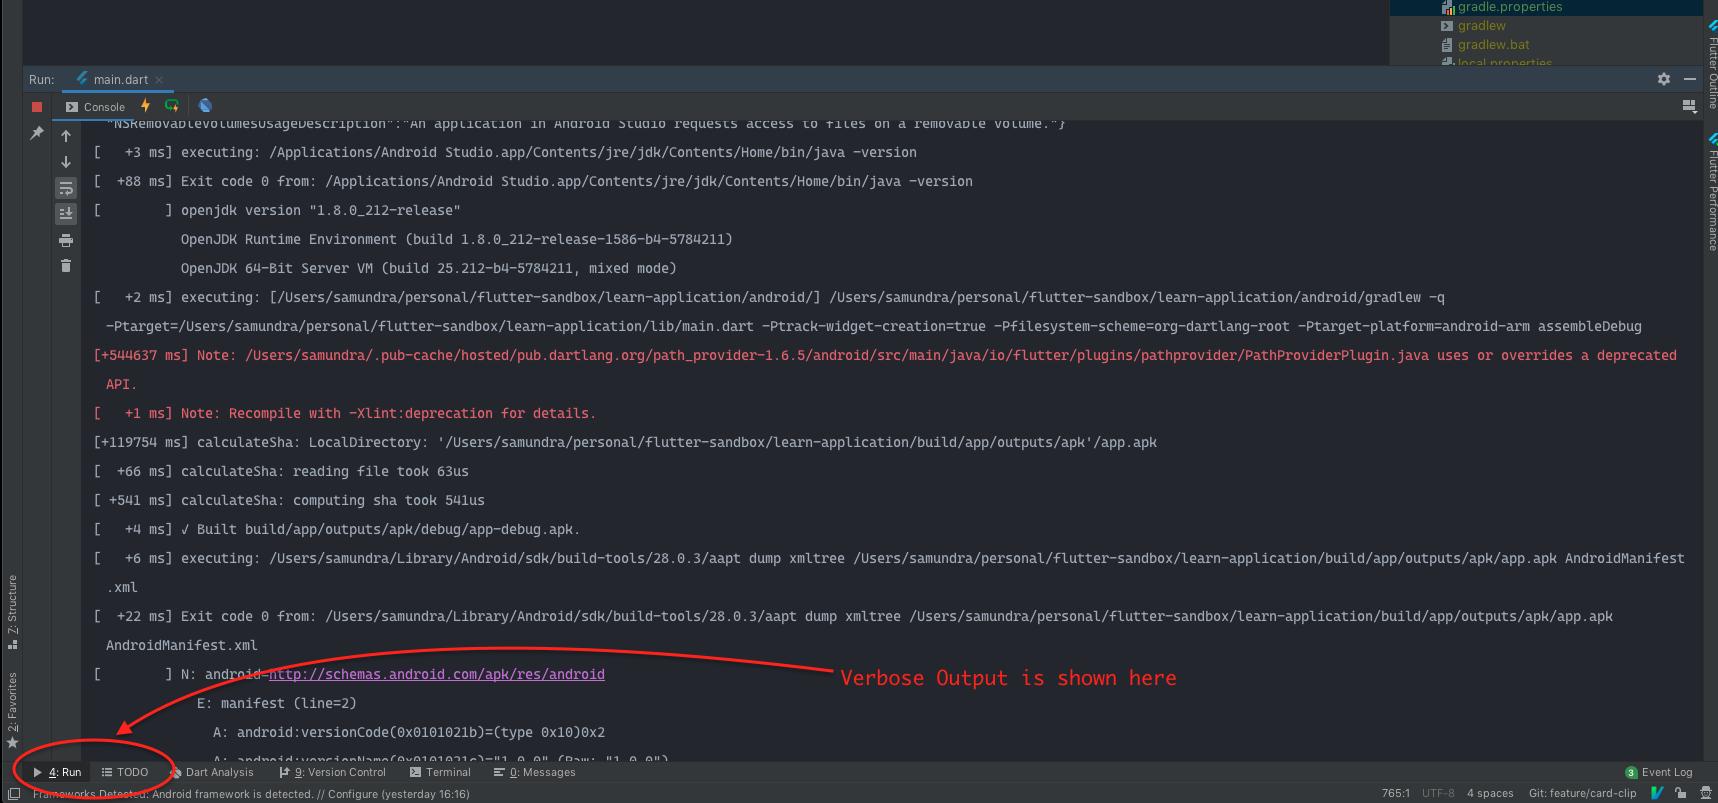 Verbose output of Flutter Run Project